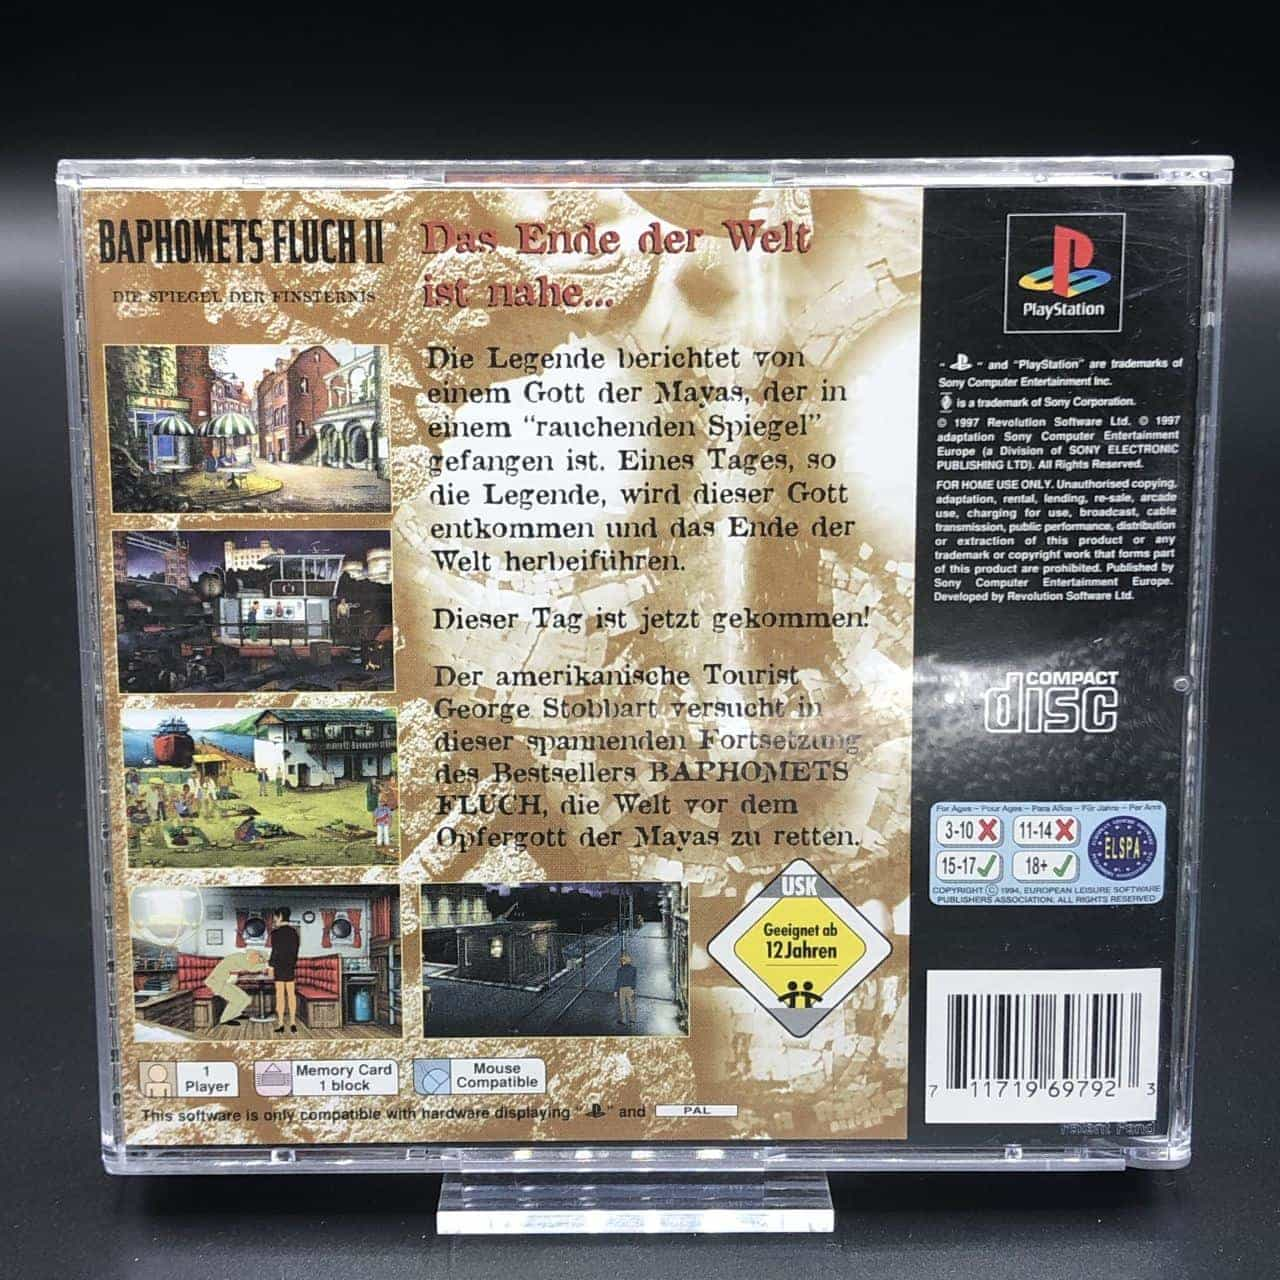 PS1 Baphomets Fluch II Die Spiegel der Finsternis (Komplett) (Gut) Sony PlayStation 1